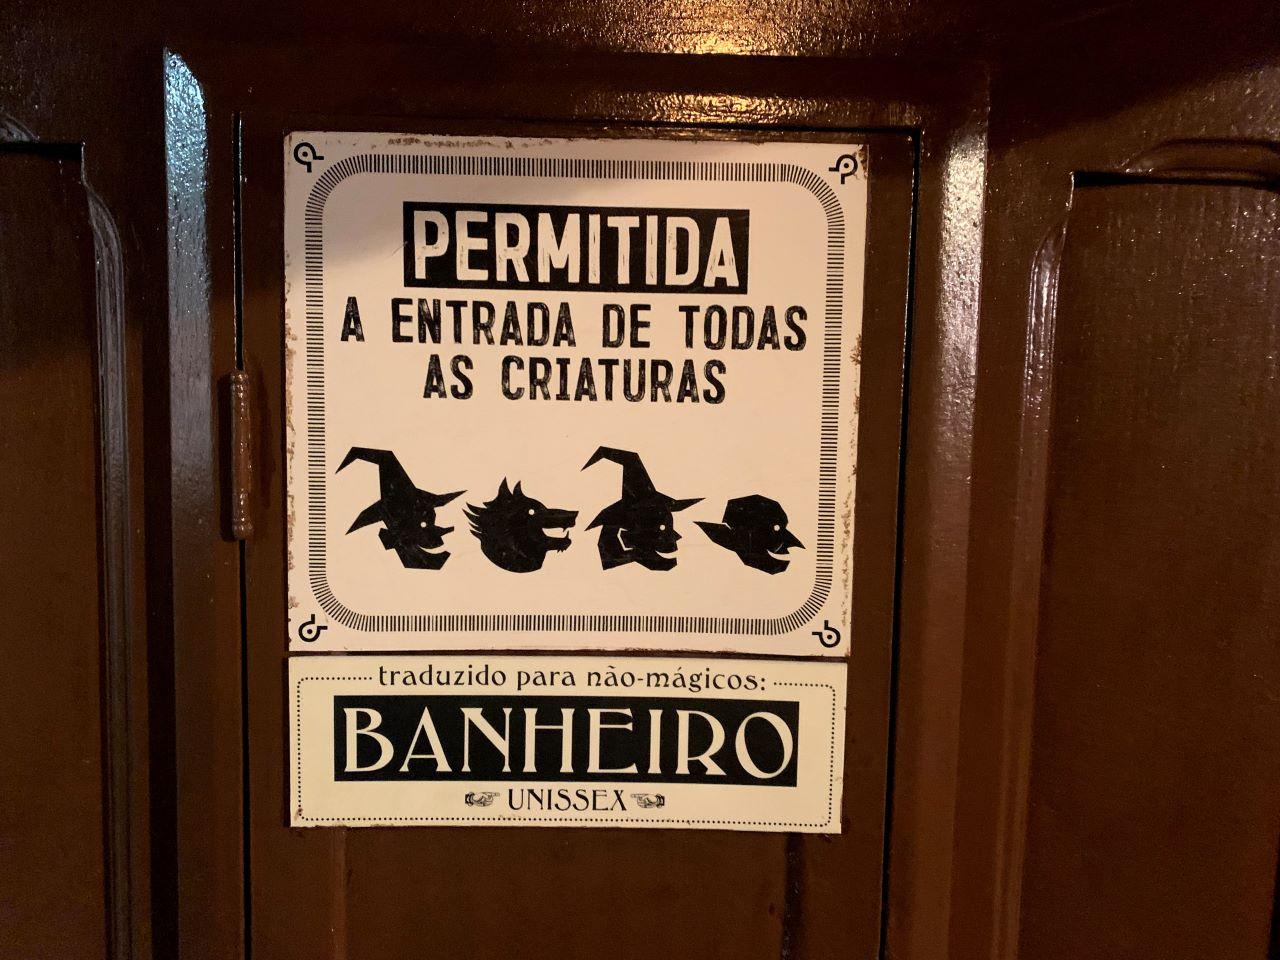 cartaz permitida a entrada de todas as criaturas